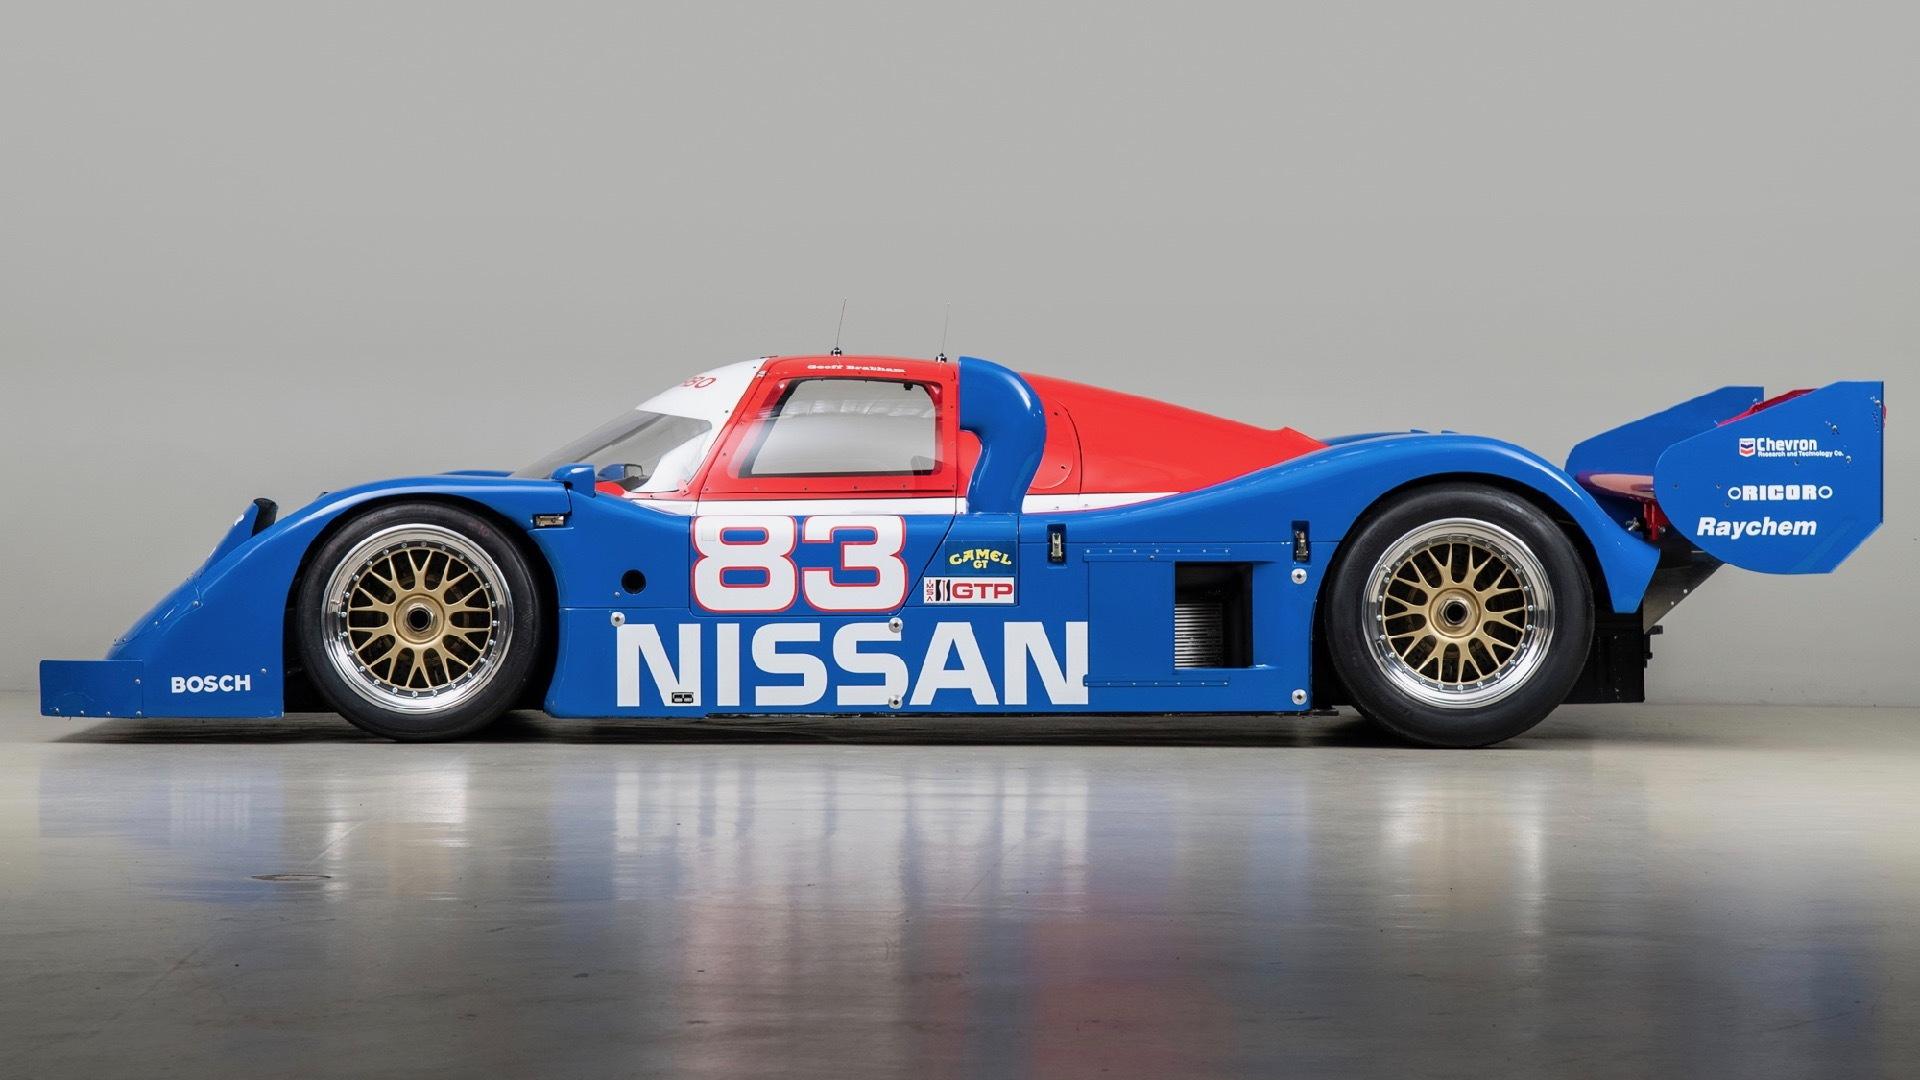 1990 Nissan NPT-90 (Photo by Canepa)